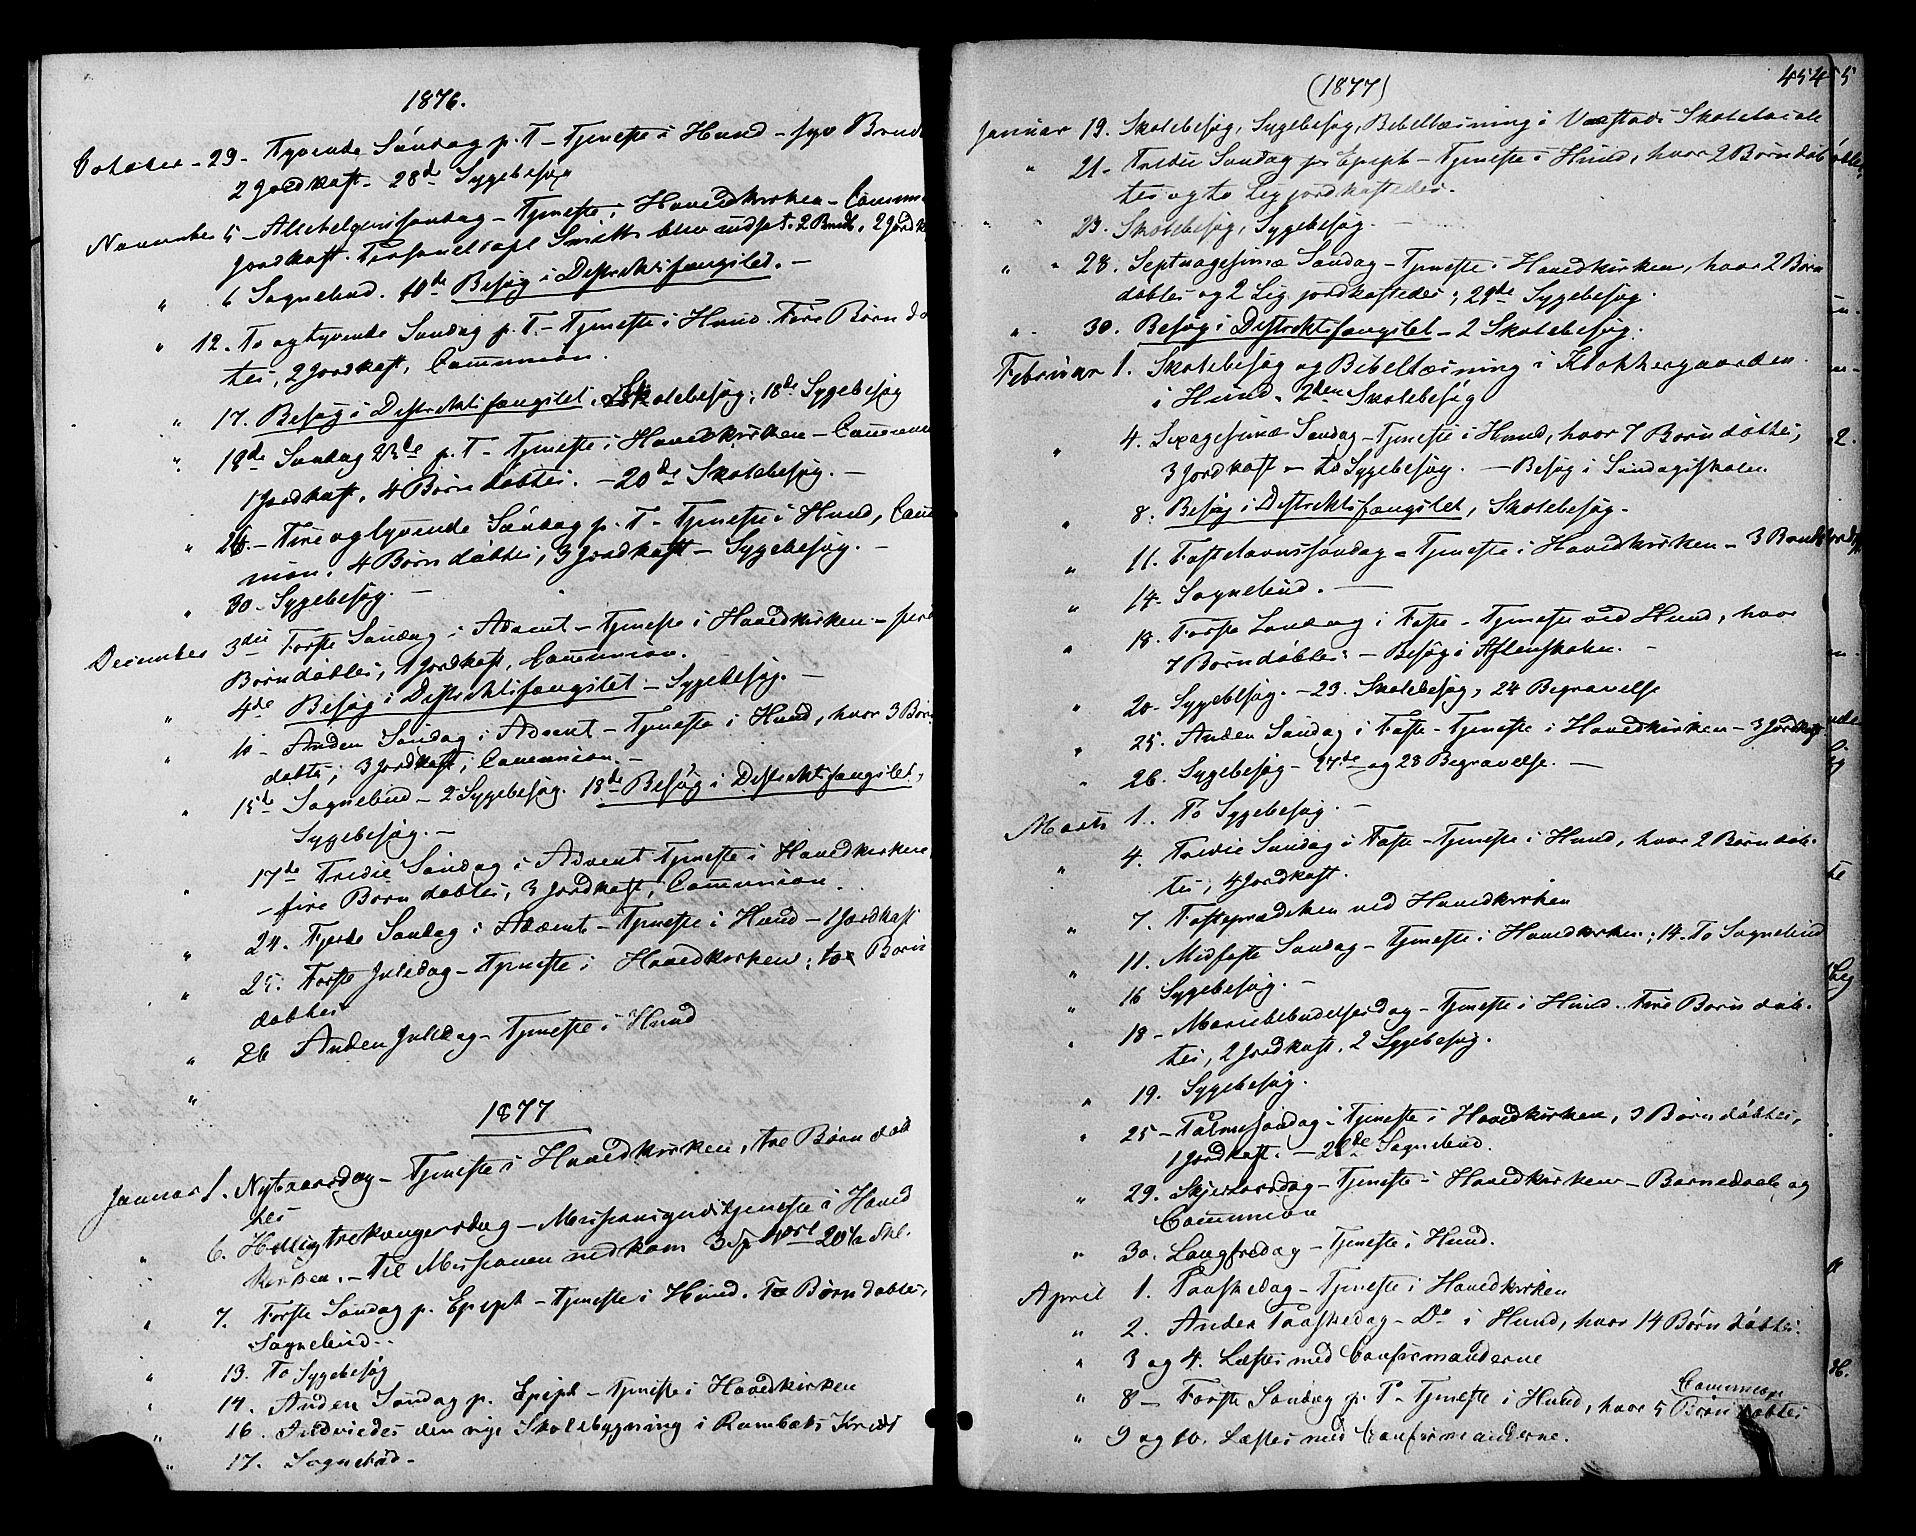 SAH, Vardal prestekontor, H/Ha/Haa/L0007: Ministerialbok nr. 7, 1867-1878, s. 454